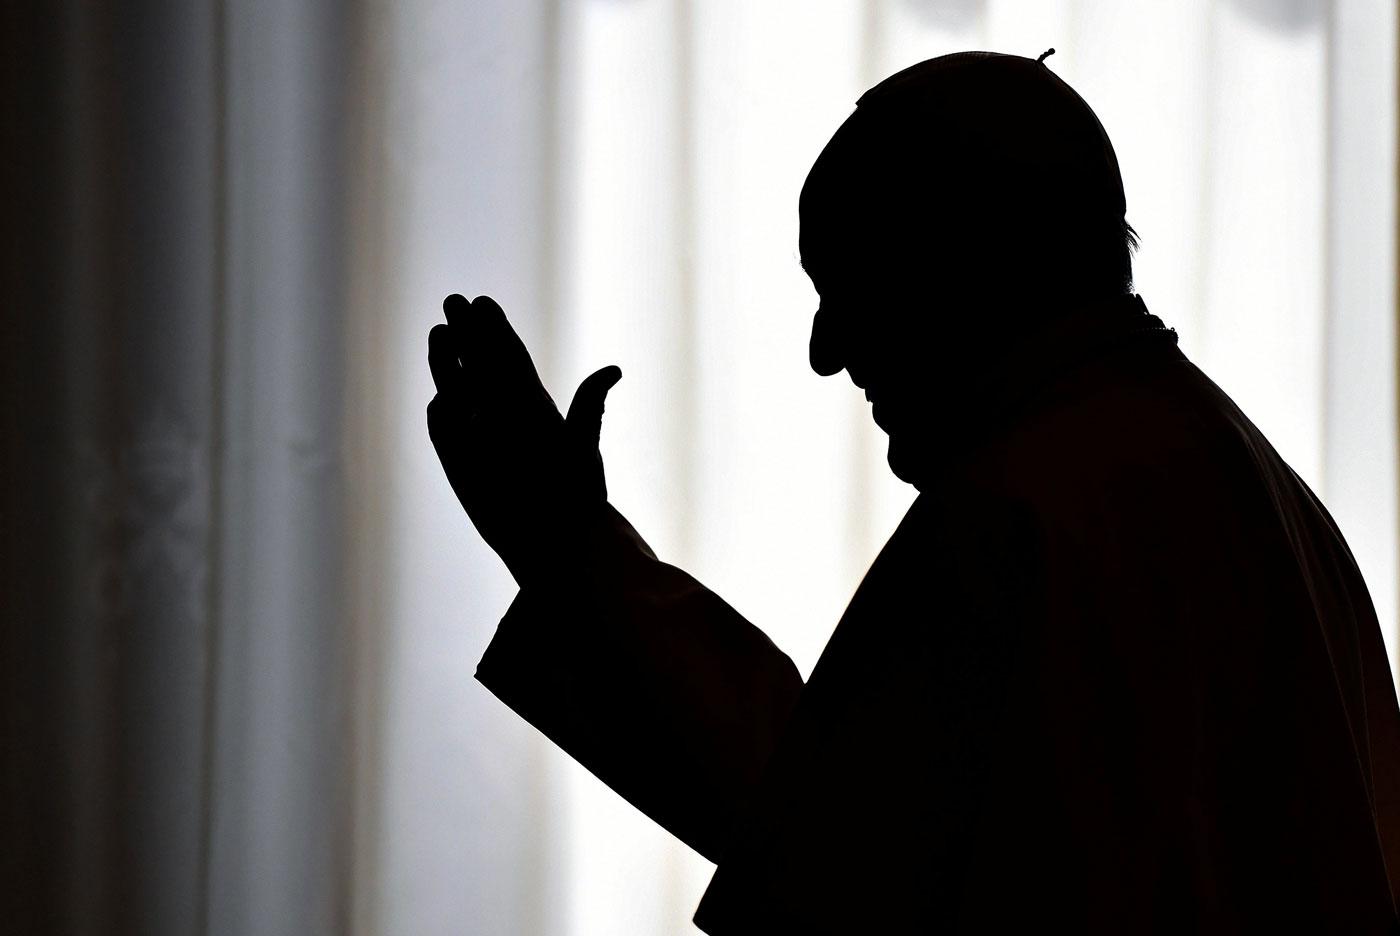 La silueta del papa Francisco (Foto archivo Reuters)